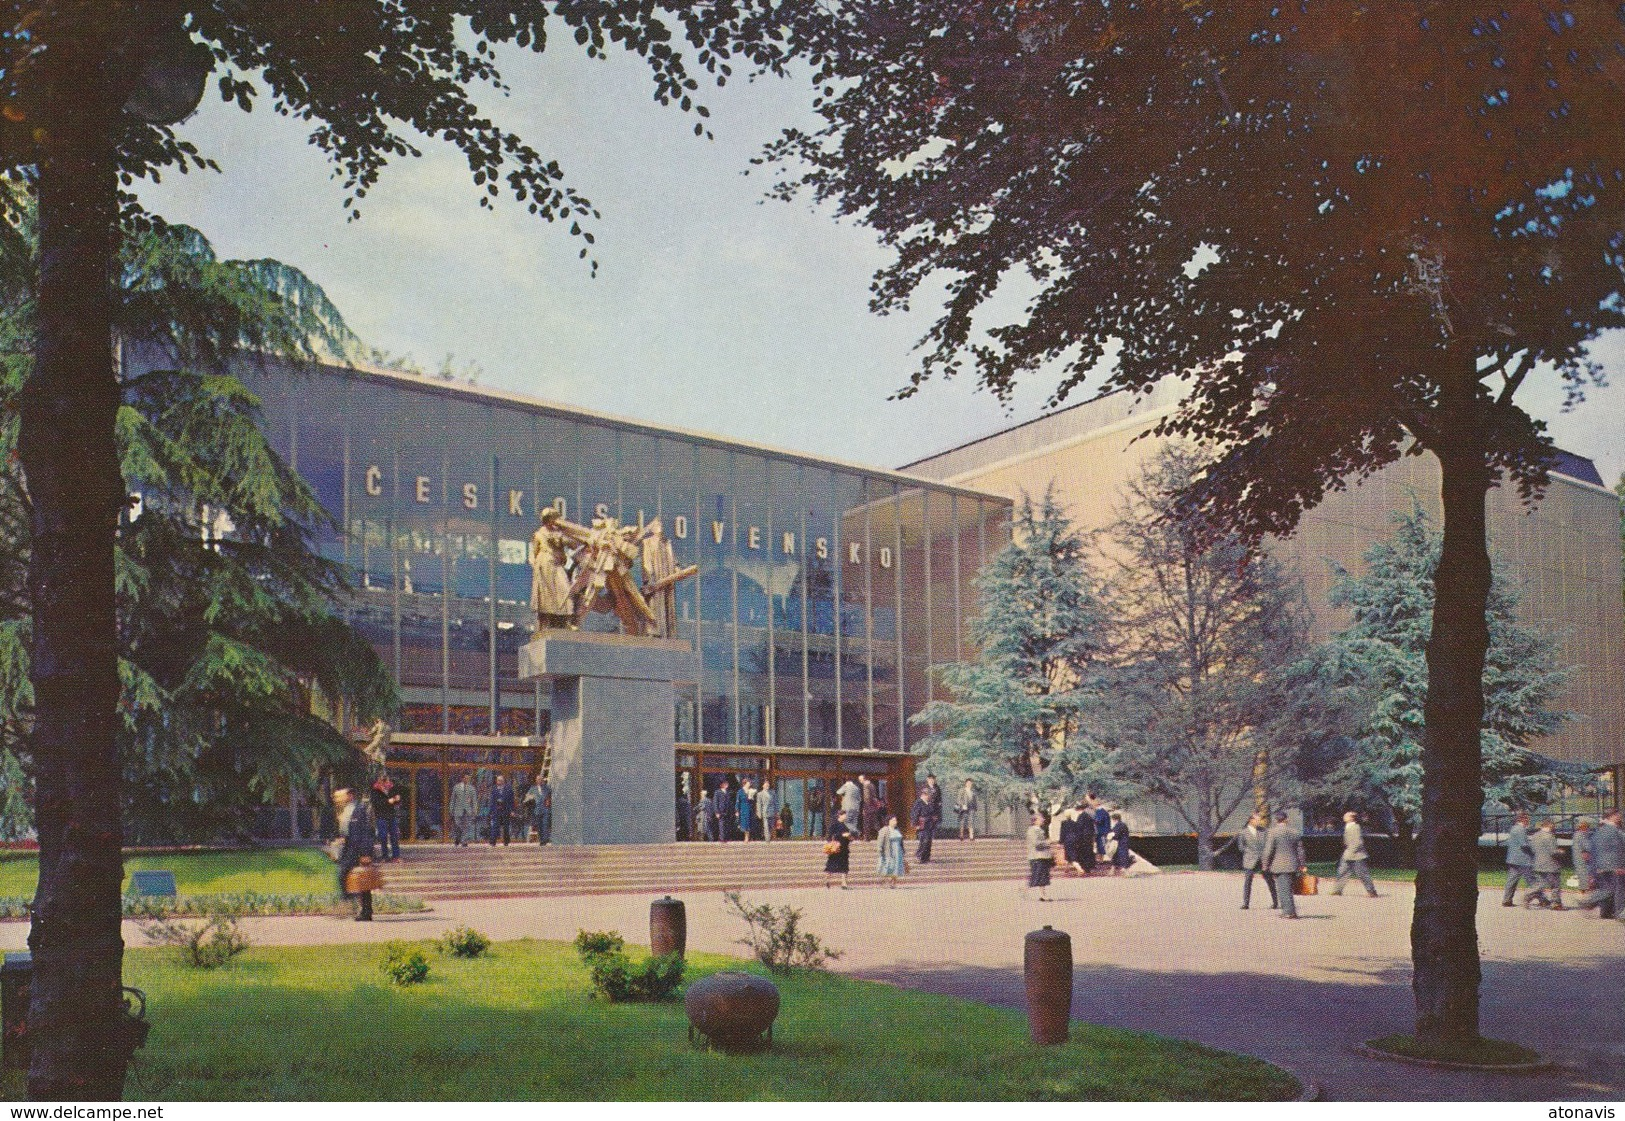 Bruxelles Expo 58 - Pavillon De Tchécoslovaquie. - Wereldtentoonstellingen